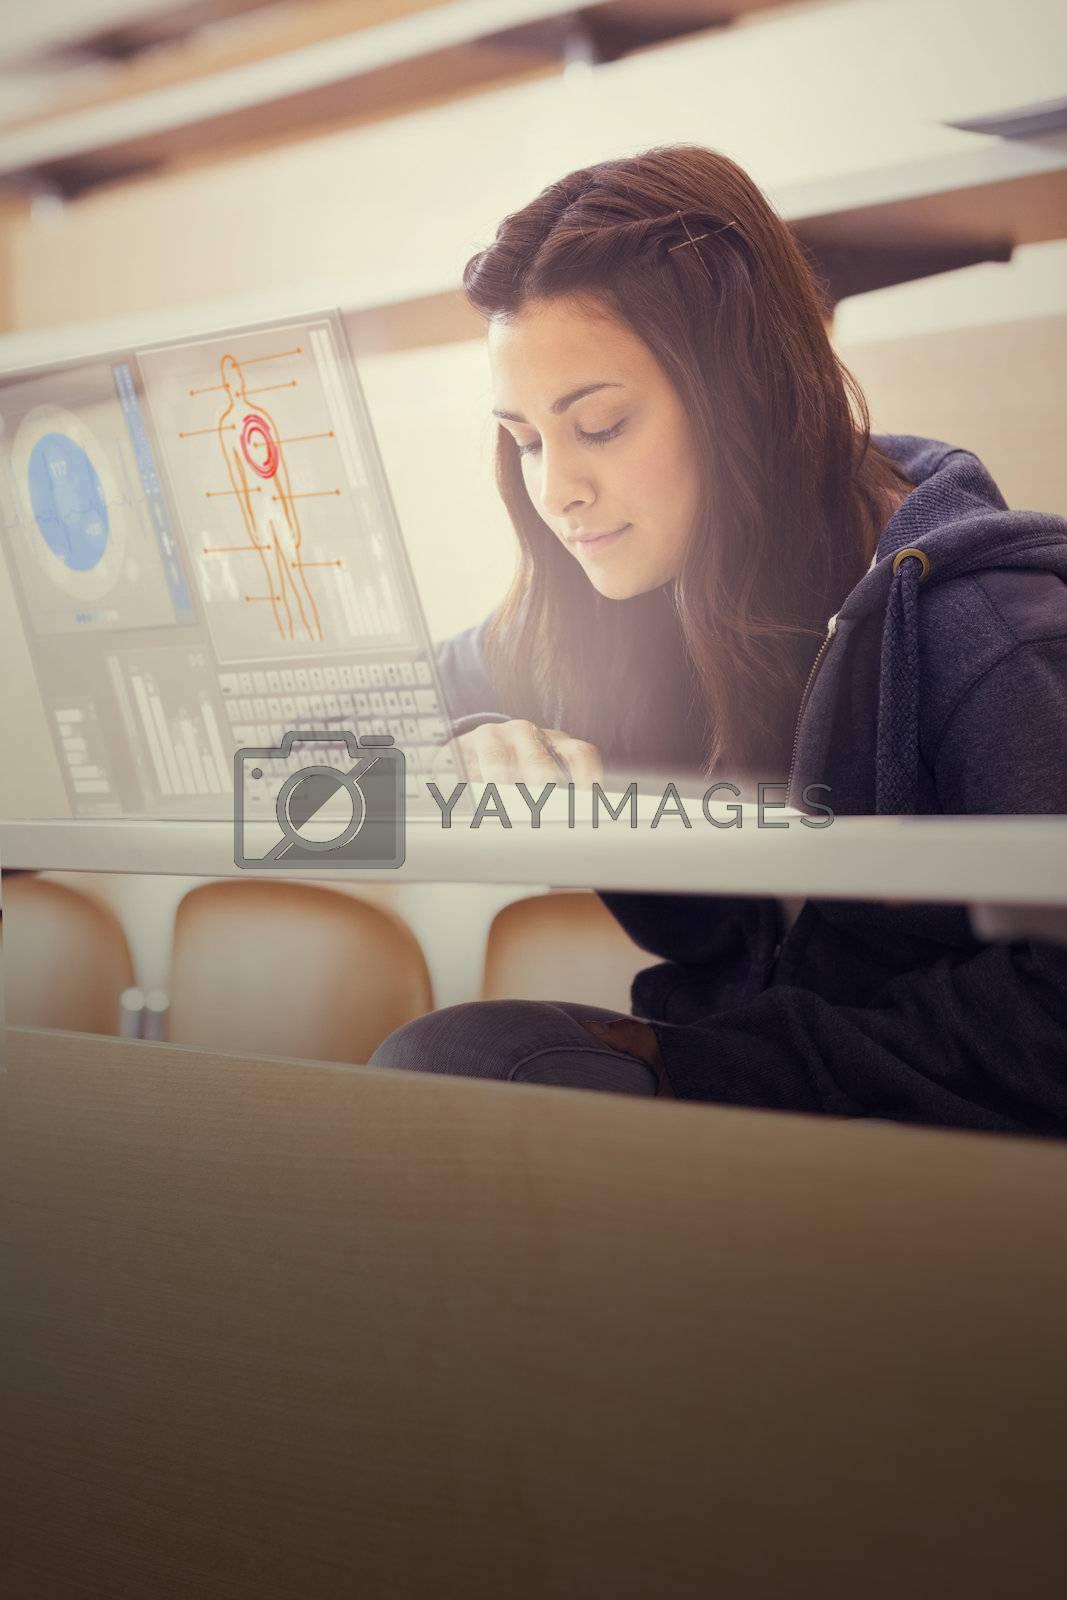 Focused college student working on her digital laptop by Wavebreakmedia